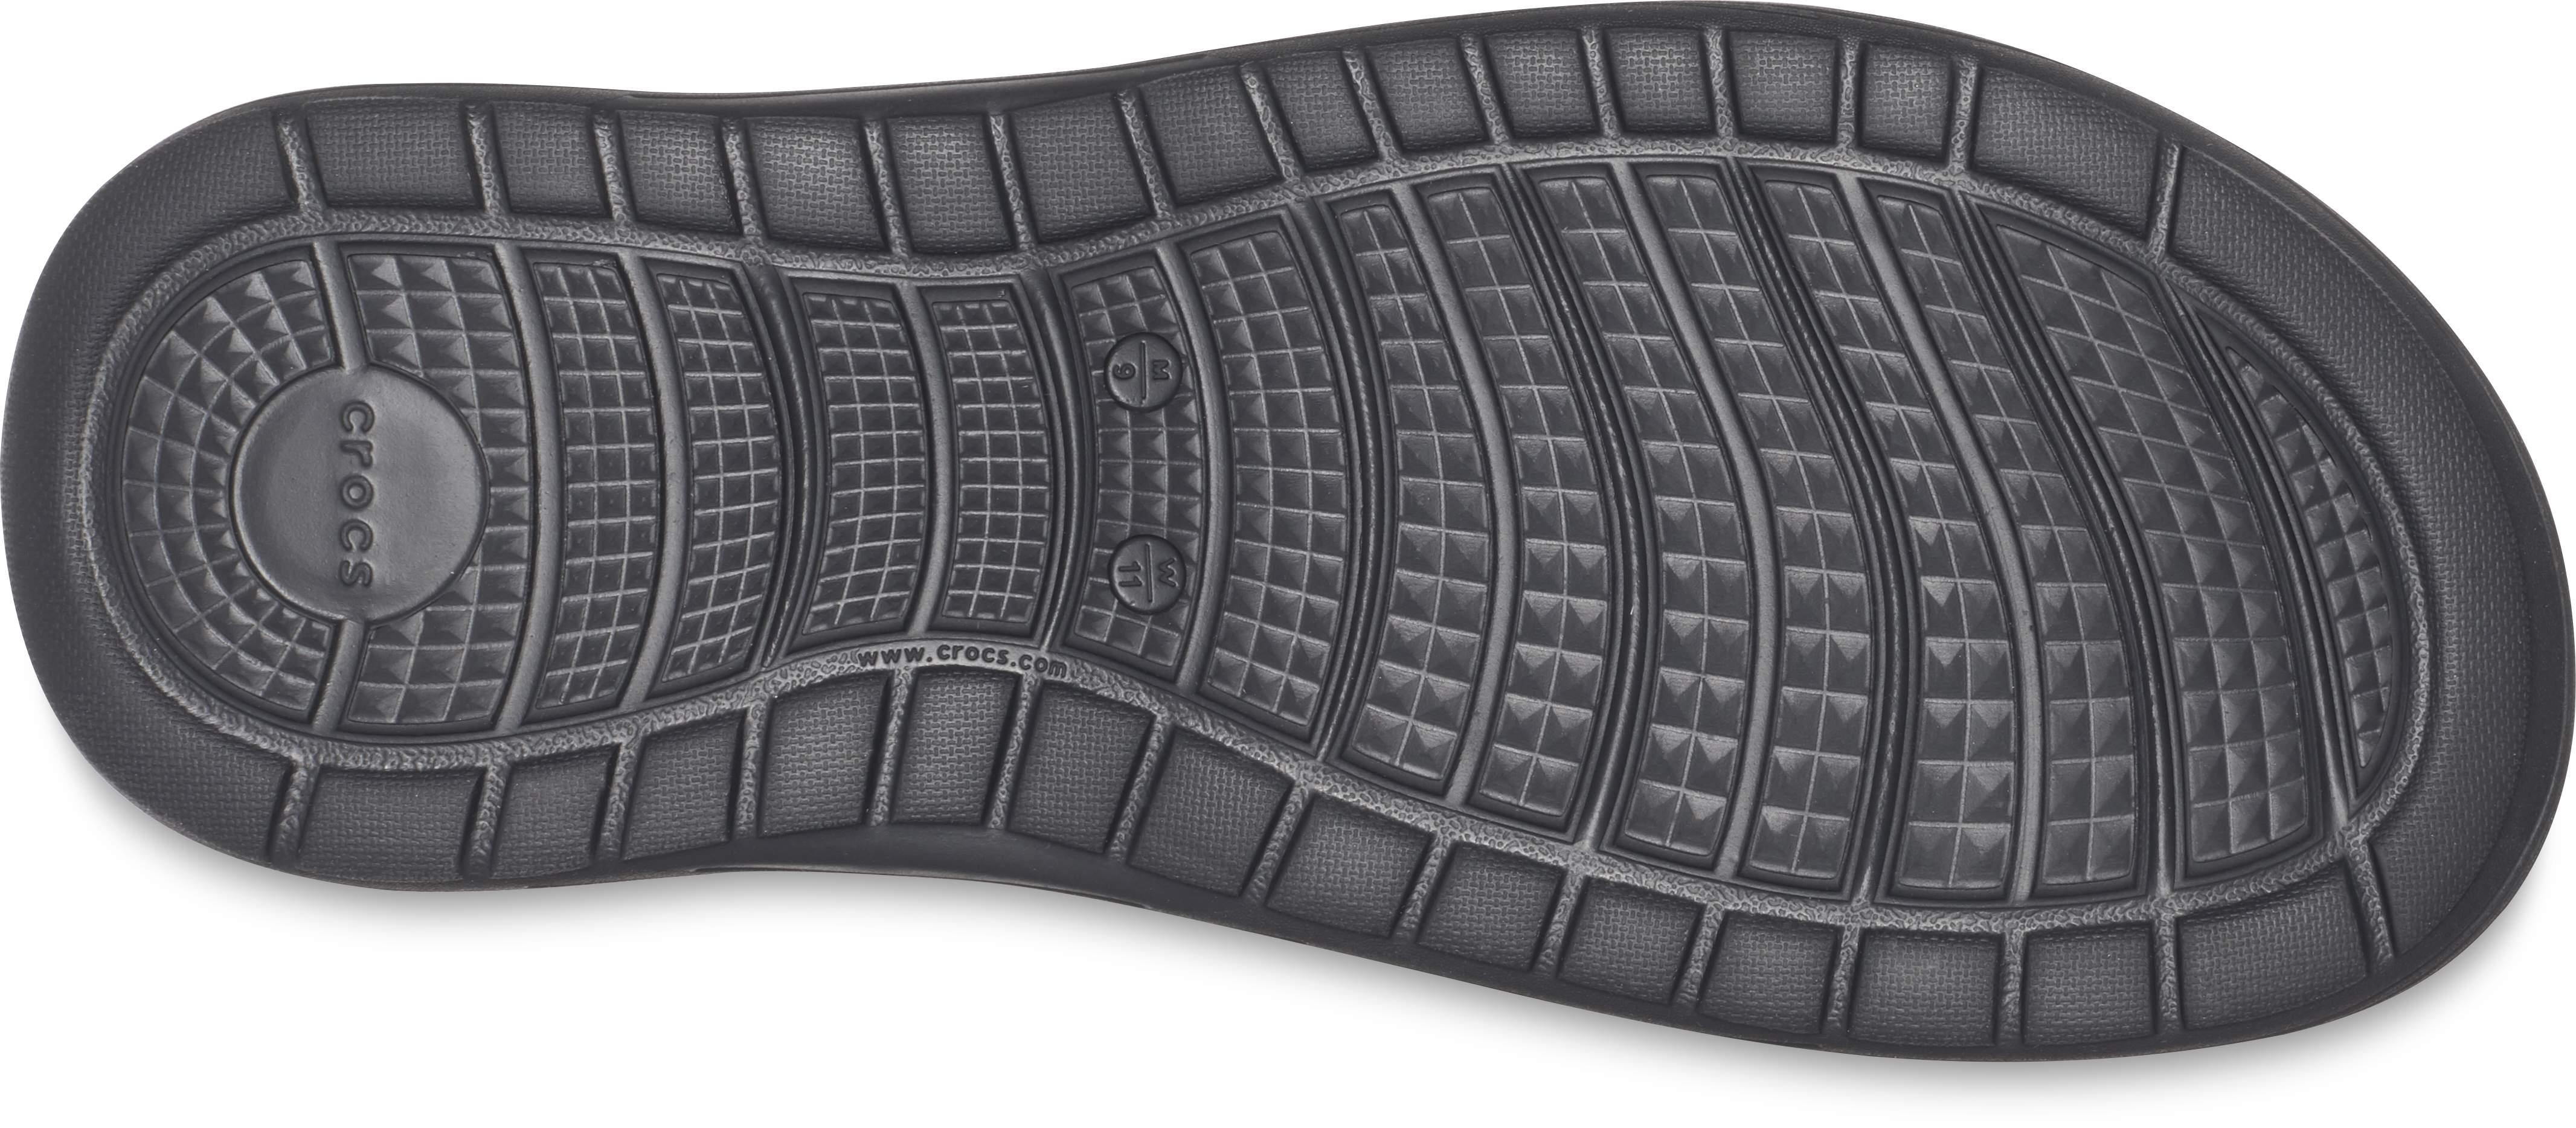 crocs Zehensteg Reviva Flip Schwarz Slate Grau Croslite Normal Unisex